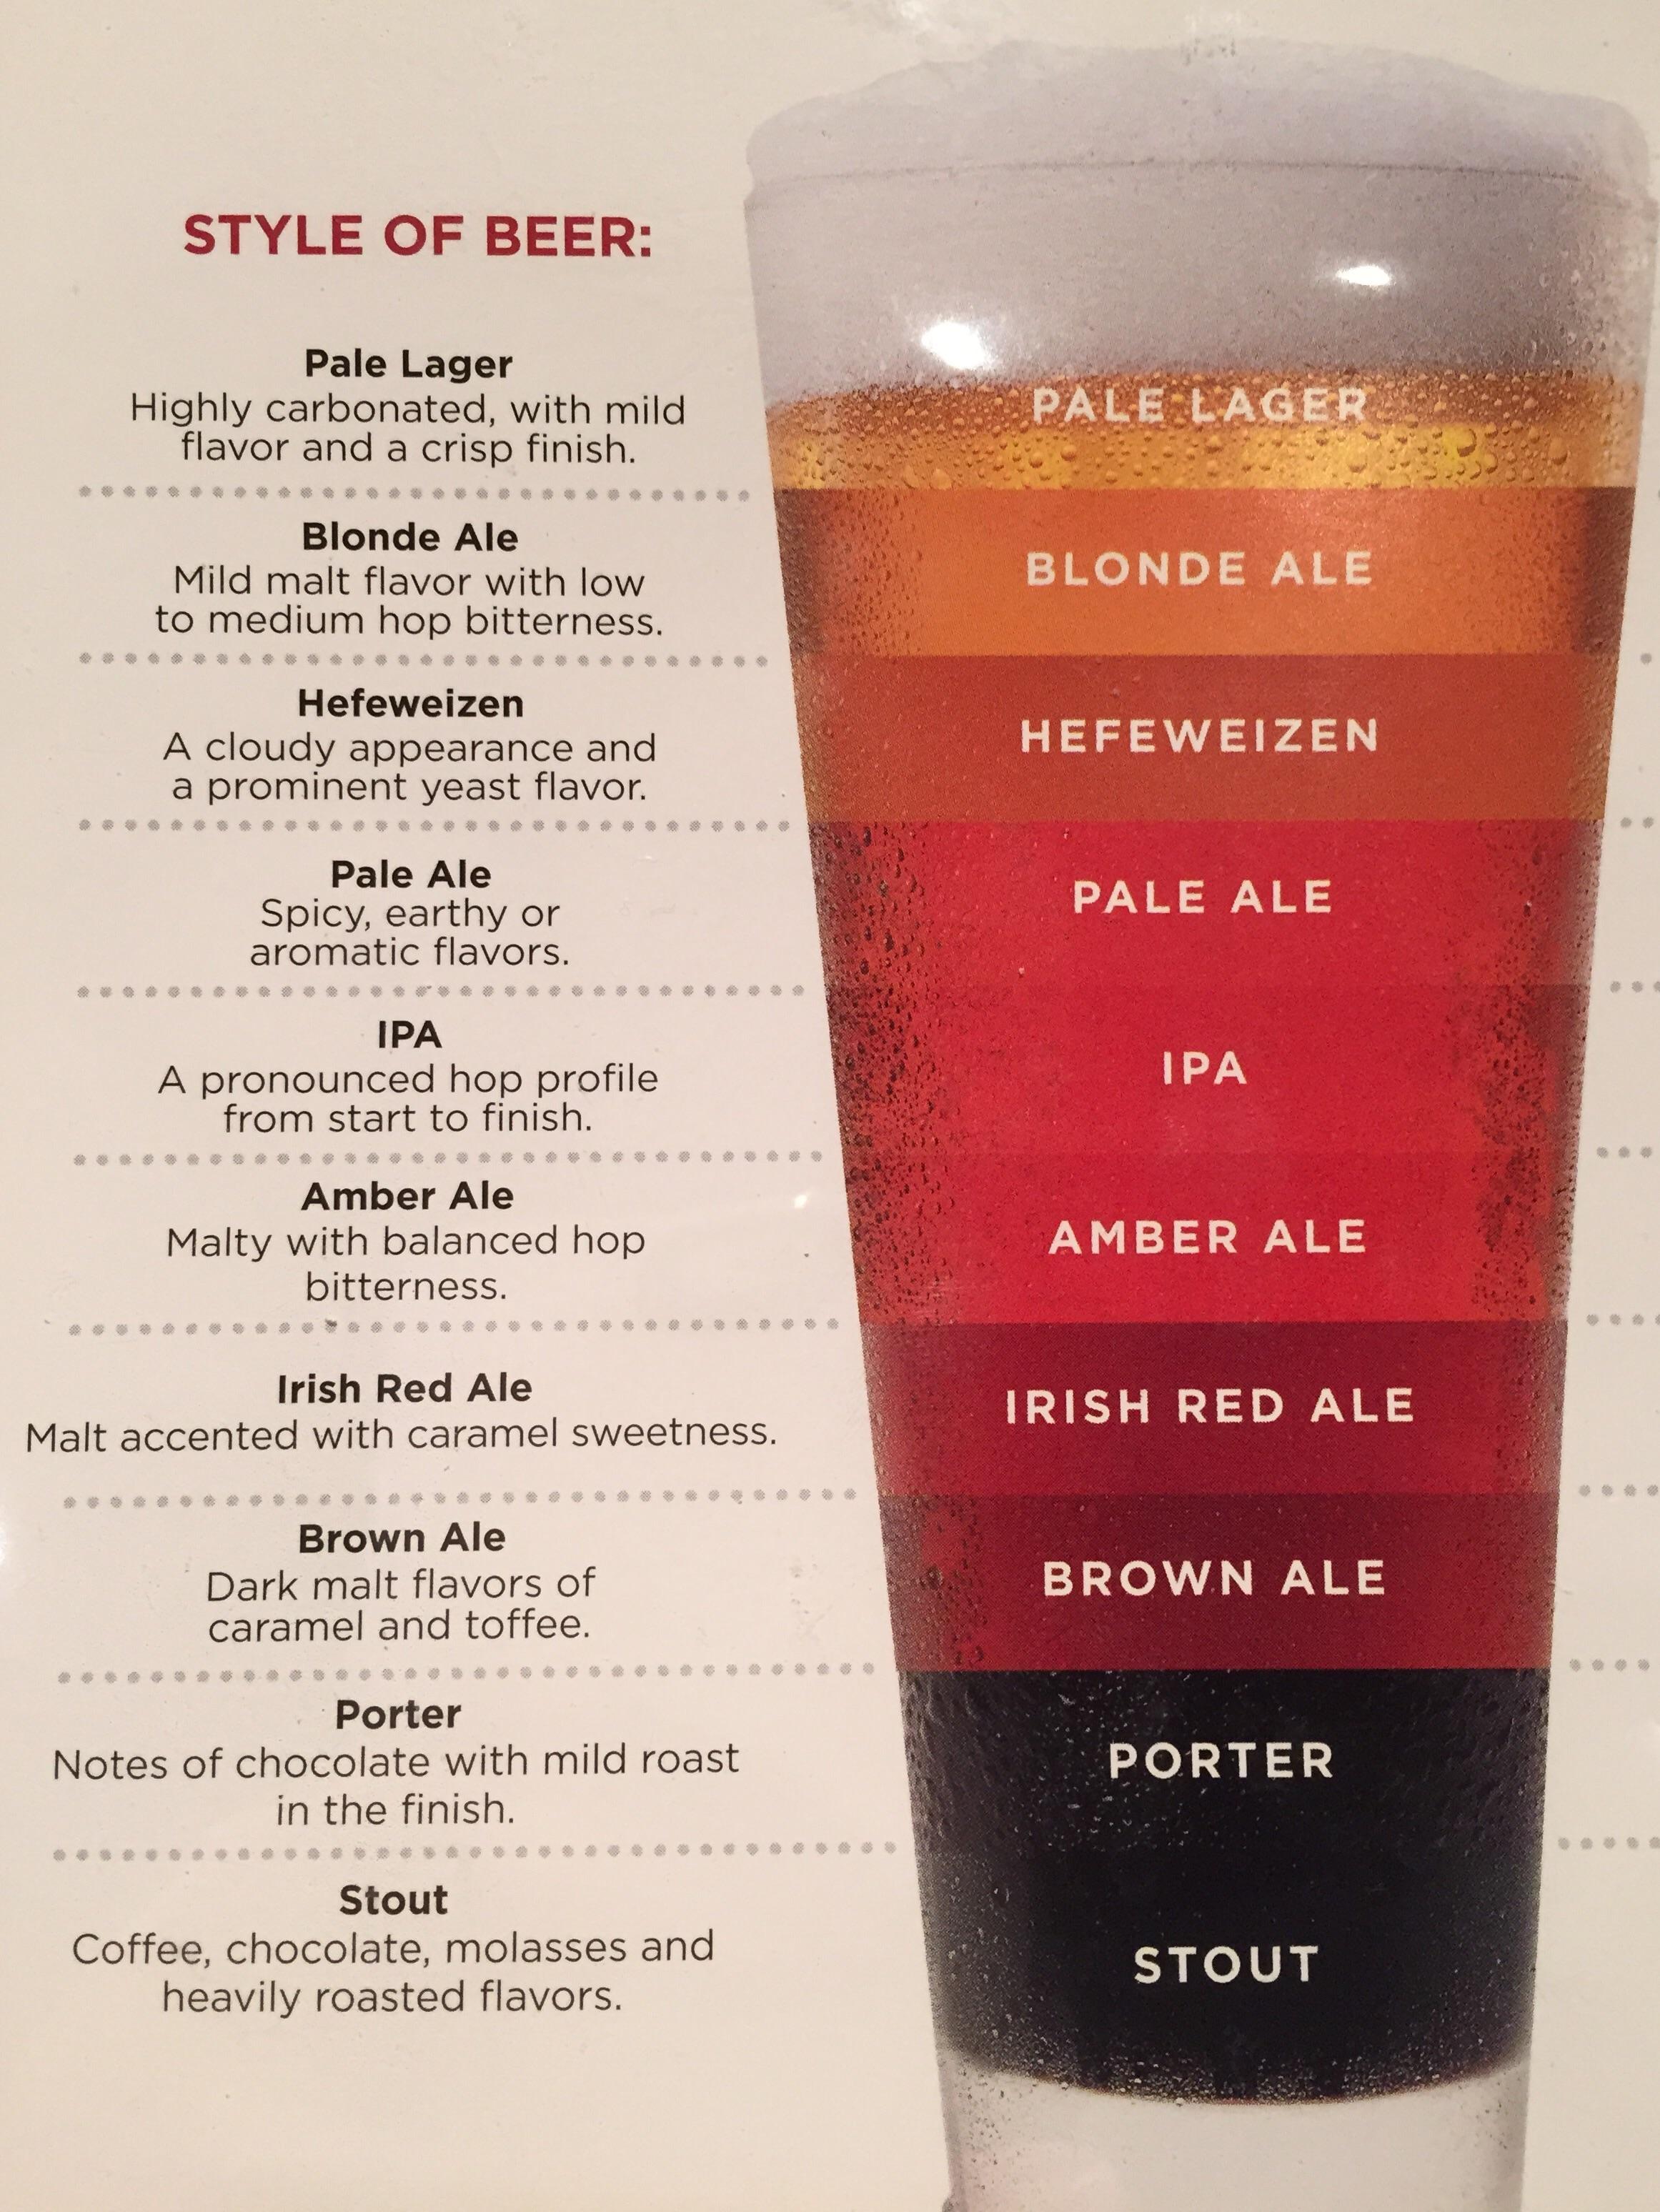 Boak & bailey's beer blog.